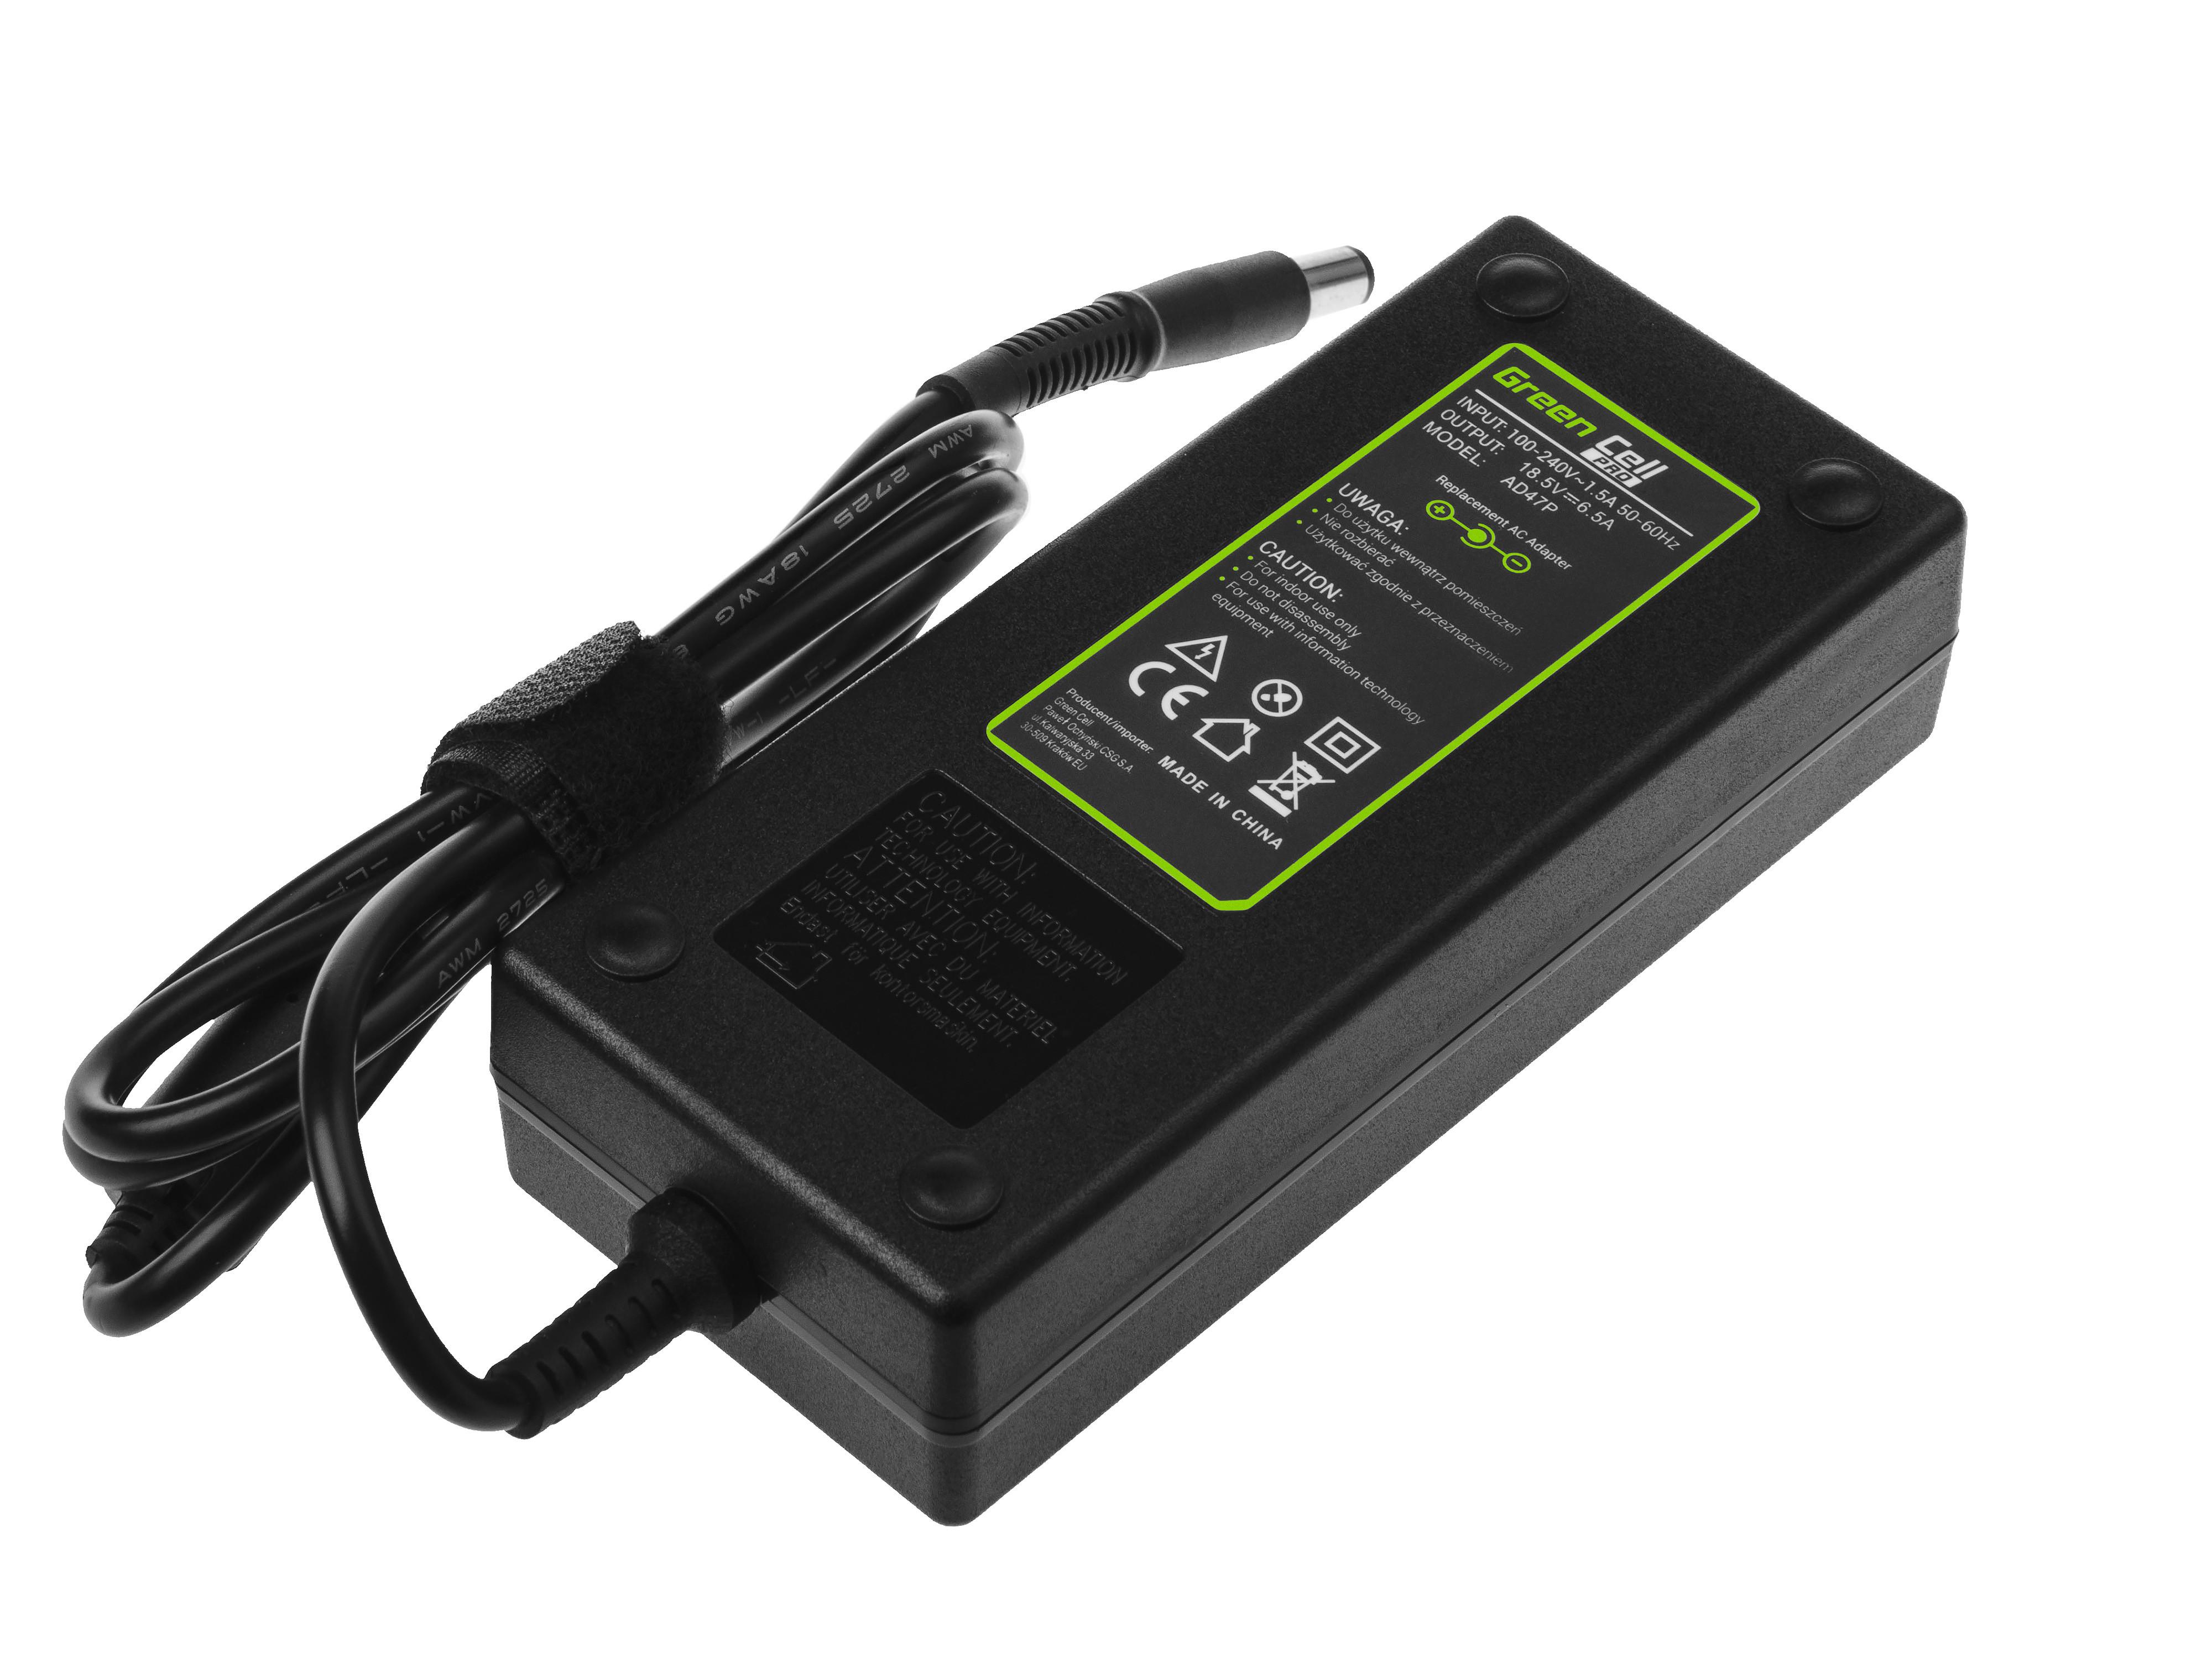 Green Cell AD47P Adaptér Nabíječka pro HP Compaq Envy Elitebook Pavilion 18.5V 6.5A 120W 7.4-5.0mm